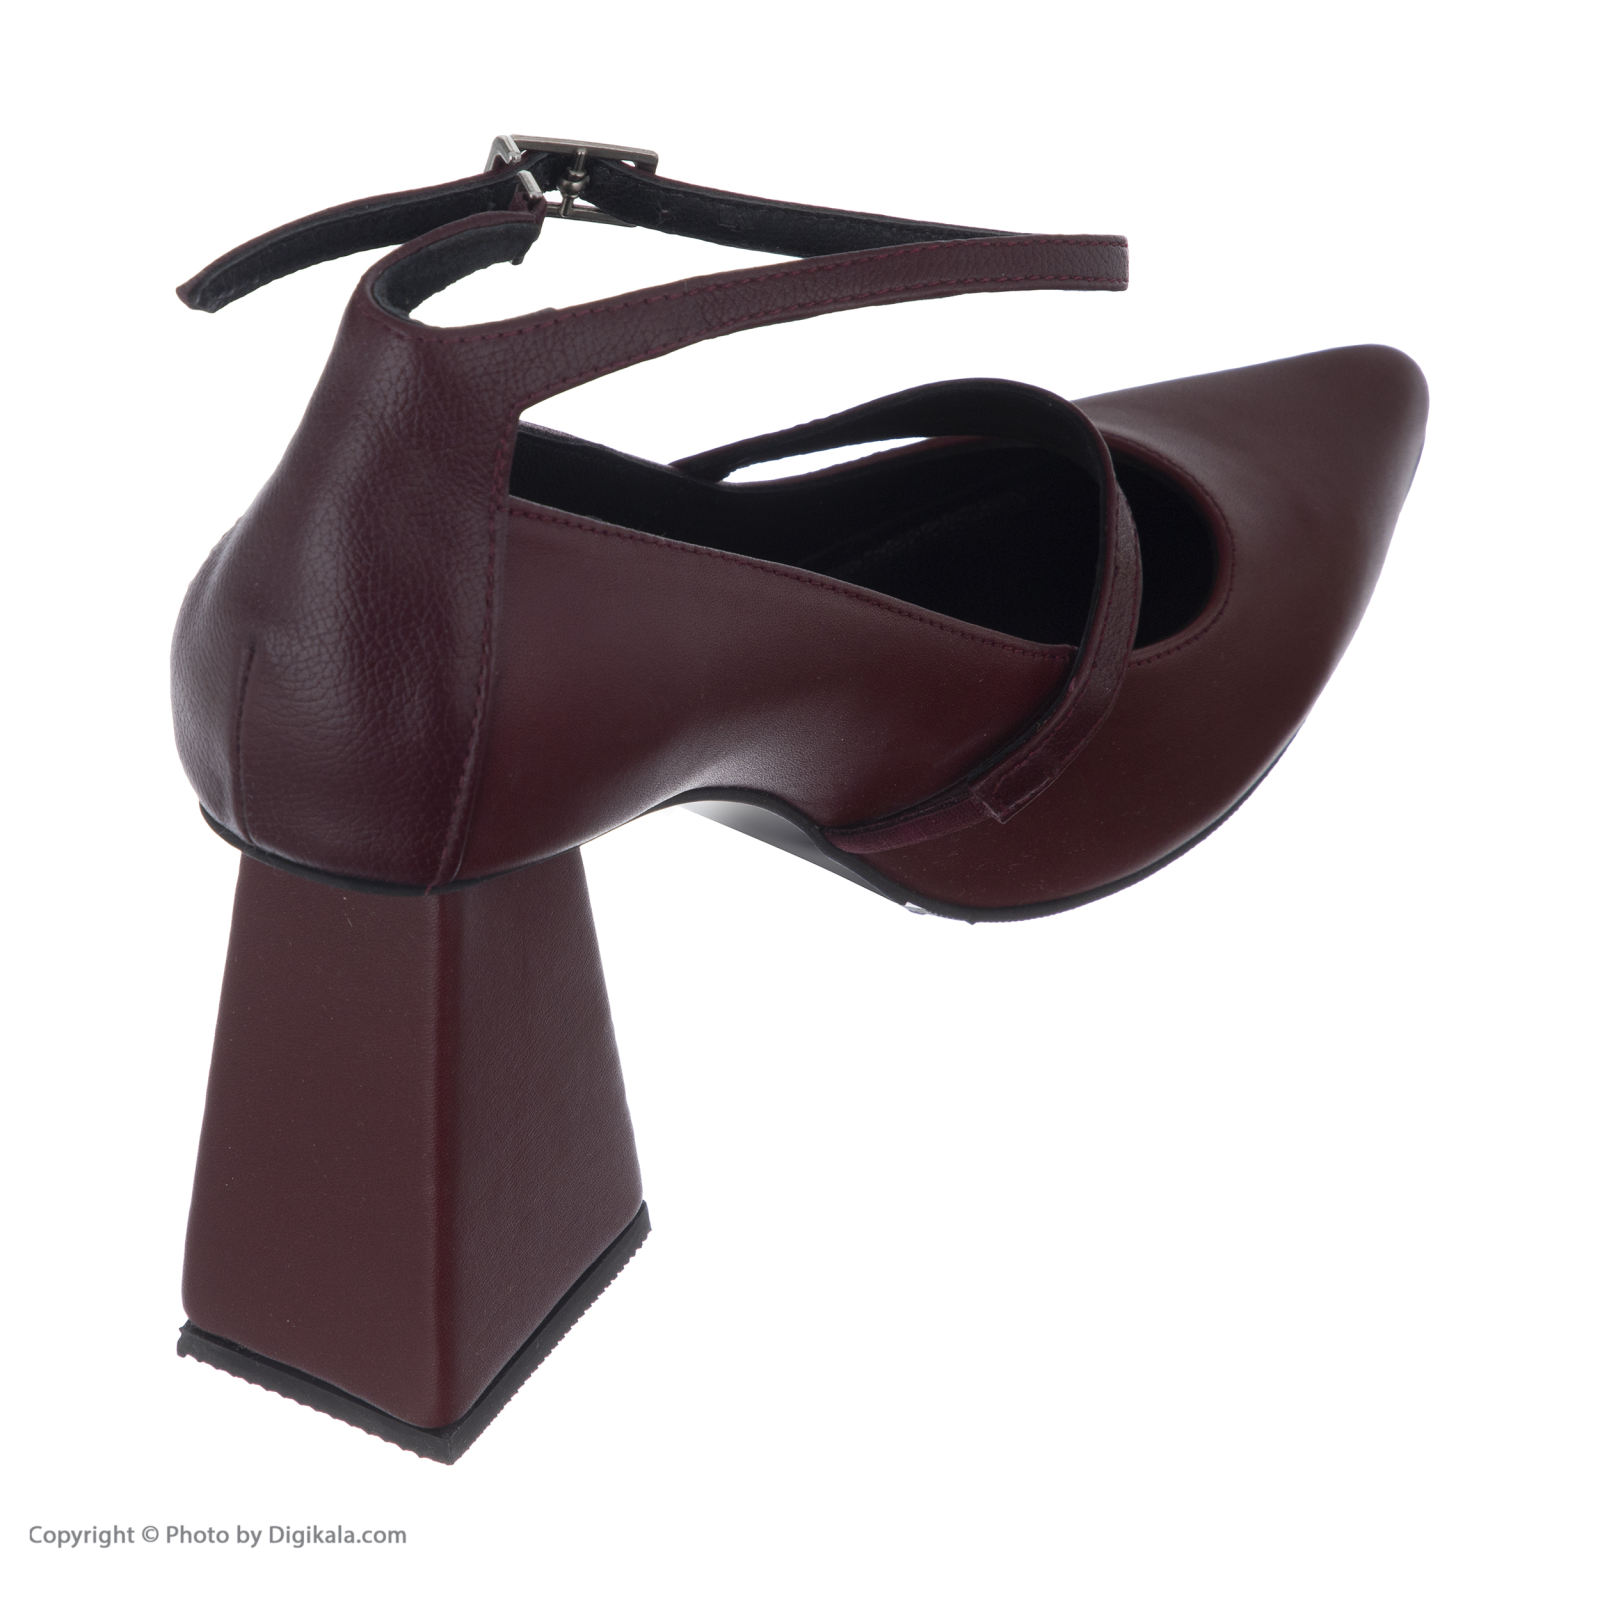 کفش زنانه آرتمن مدل Merry-41176 -  - 7